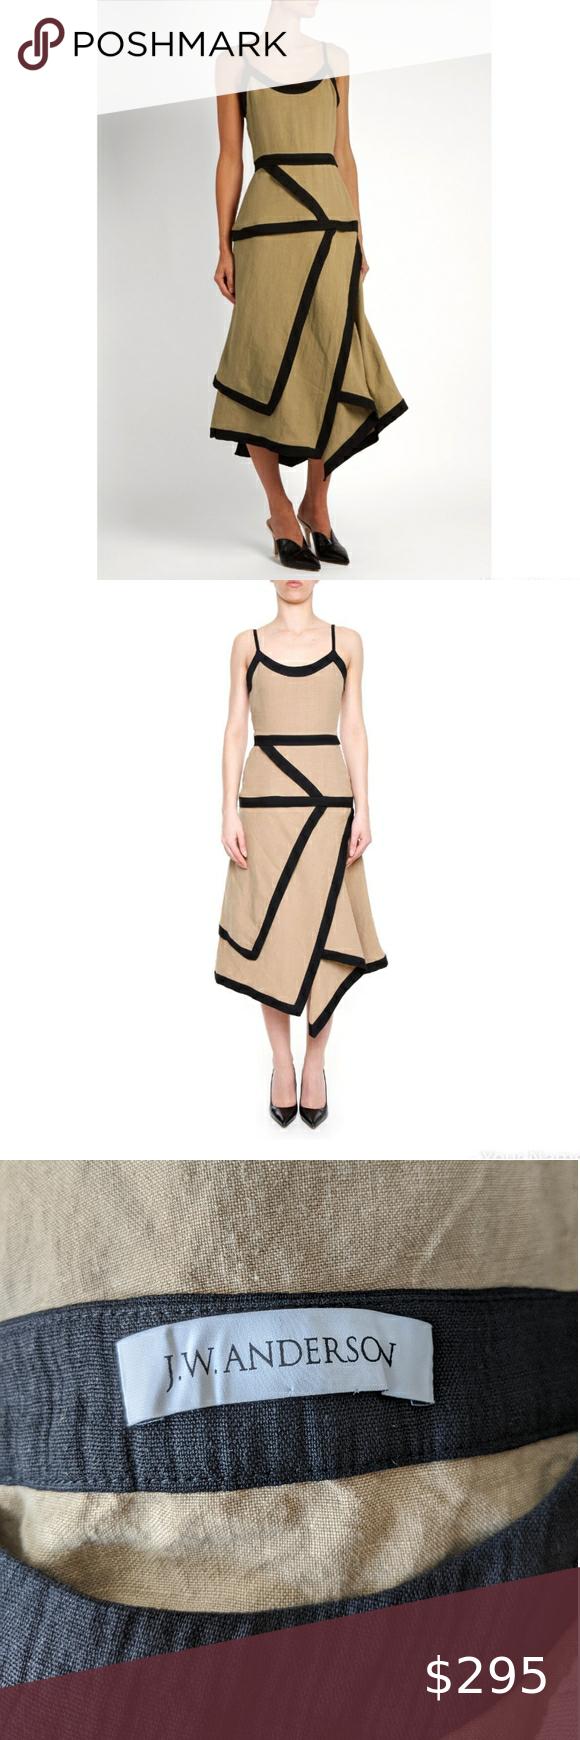 Photo of J.W. Anderson Linen Tan Black Origami Dress size 2 Gorgeous designer summer dres…